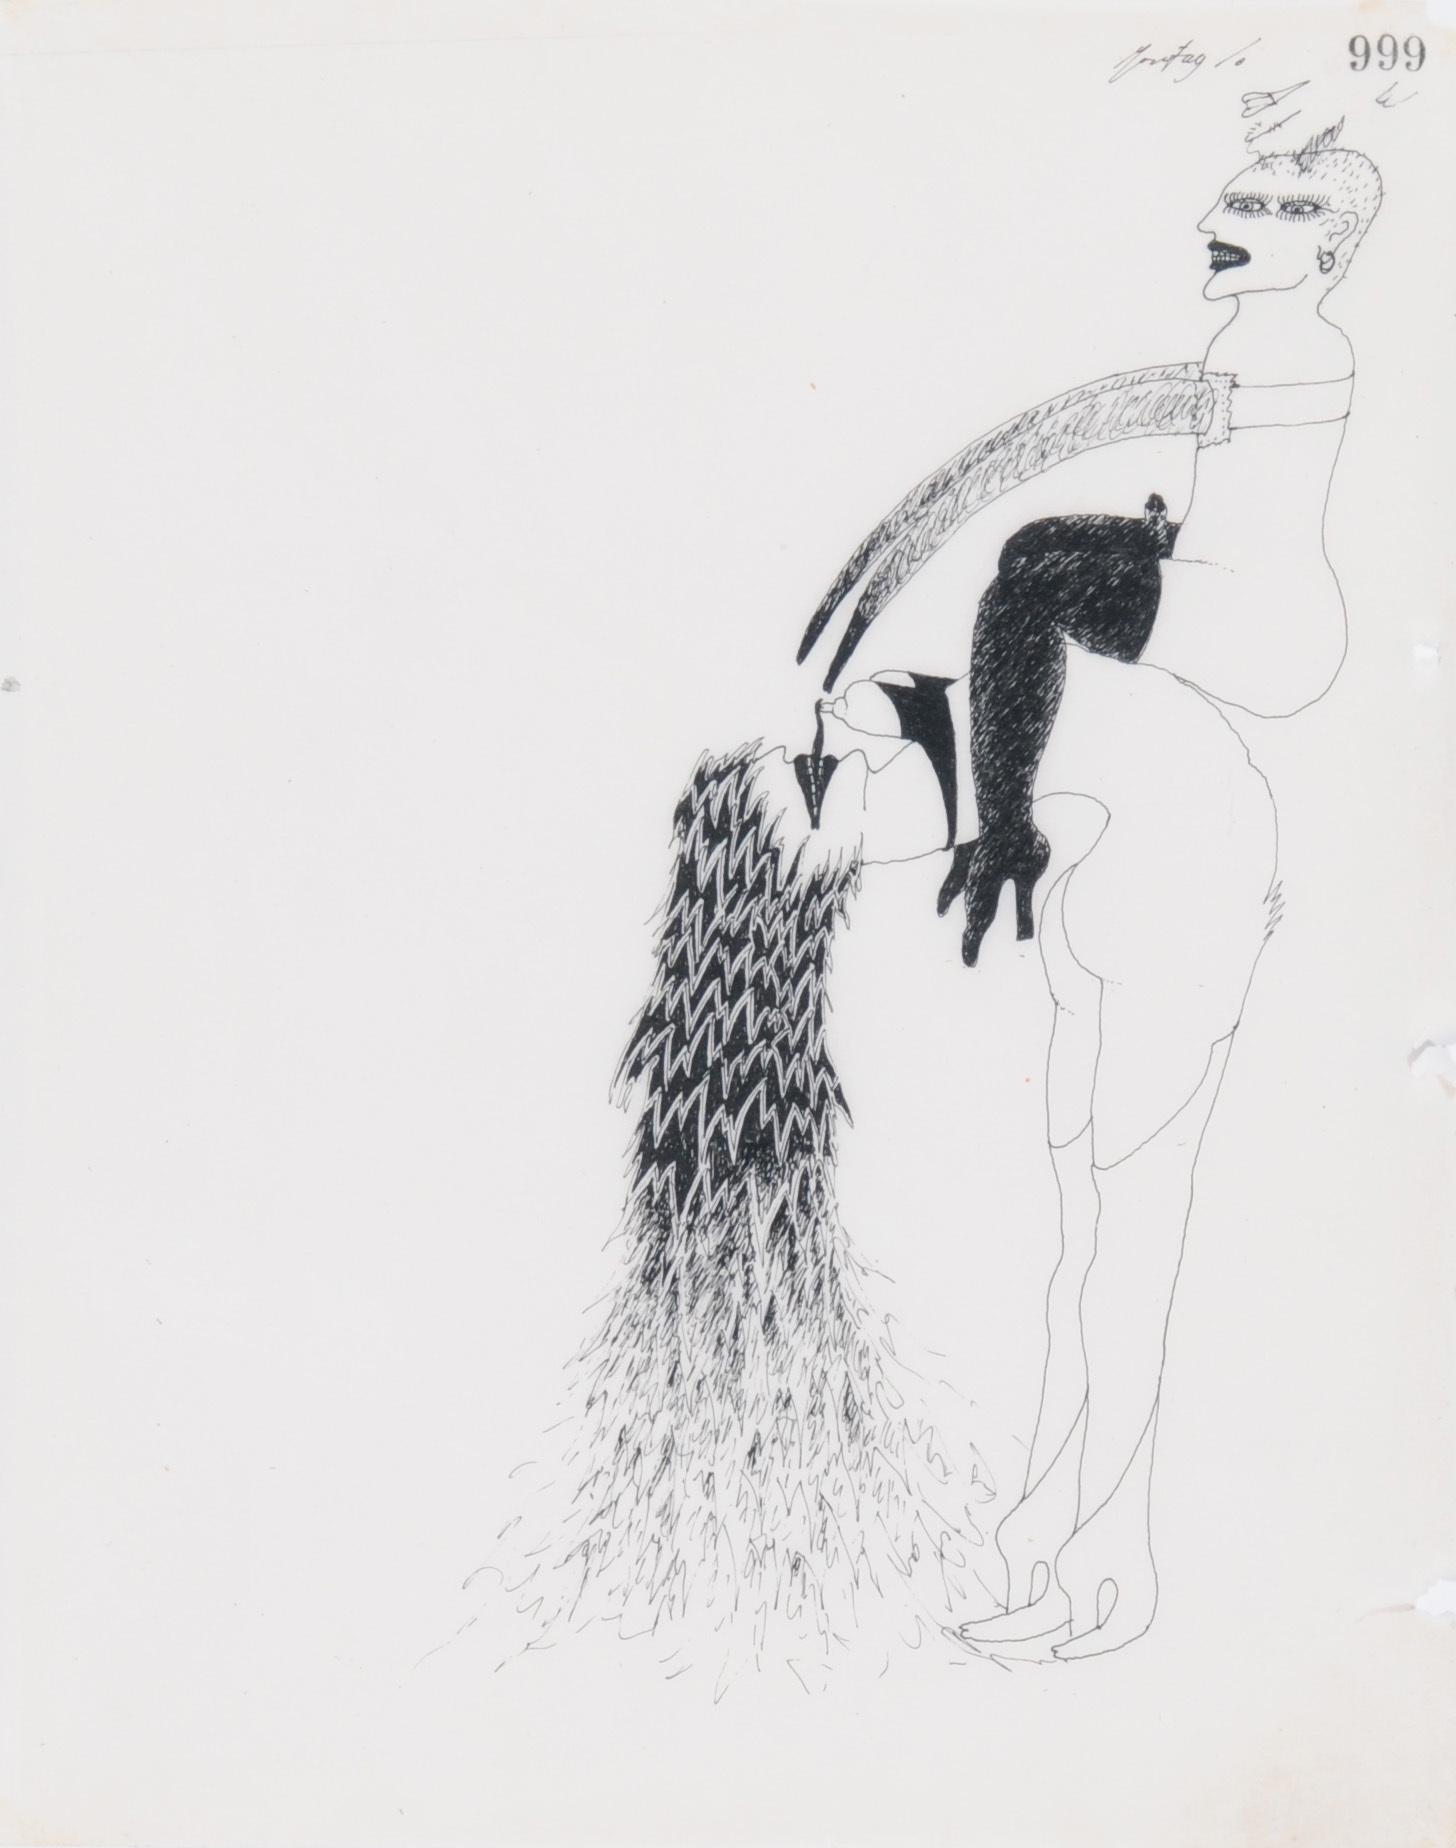 Klauke Jürgen, Untitled